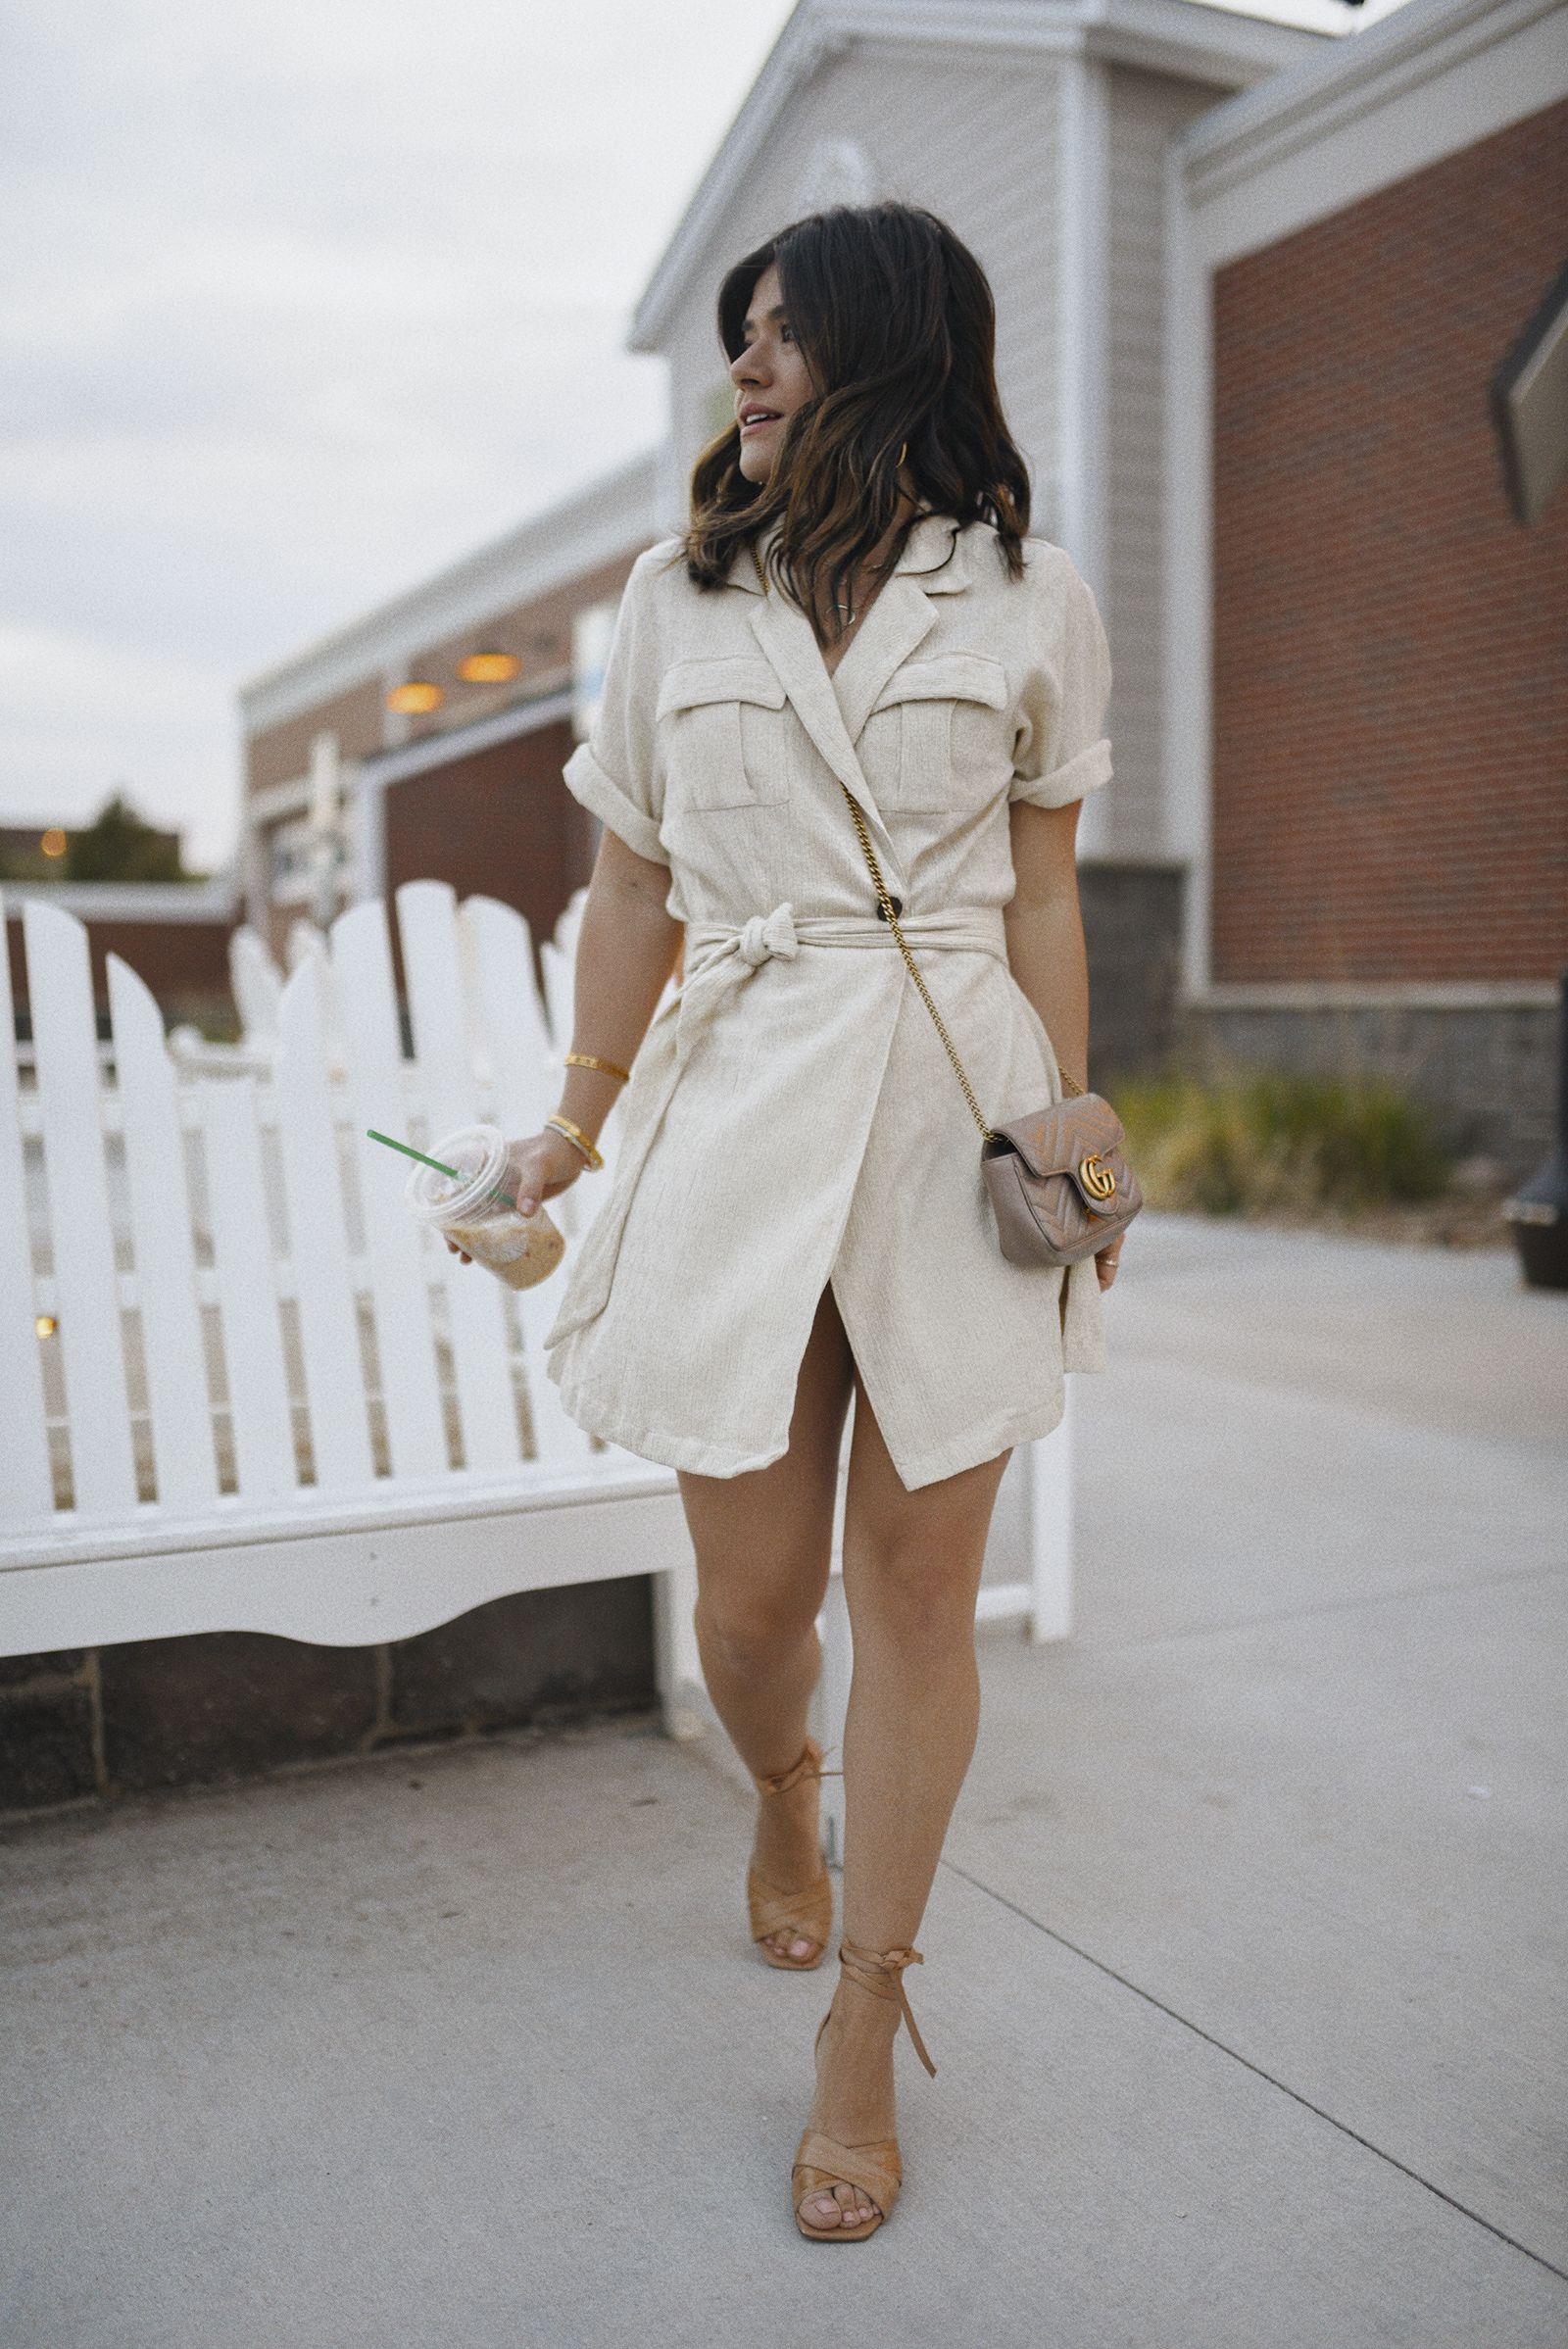 Neutral Dresses To Wear Non Stop This Summer Chic Talk In 2021 Neutral Dresses Neutral Dress Outfit Beige Shirt Dress [ 2397 x 1600 Pixel ]